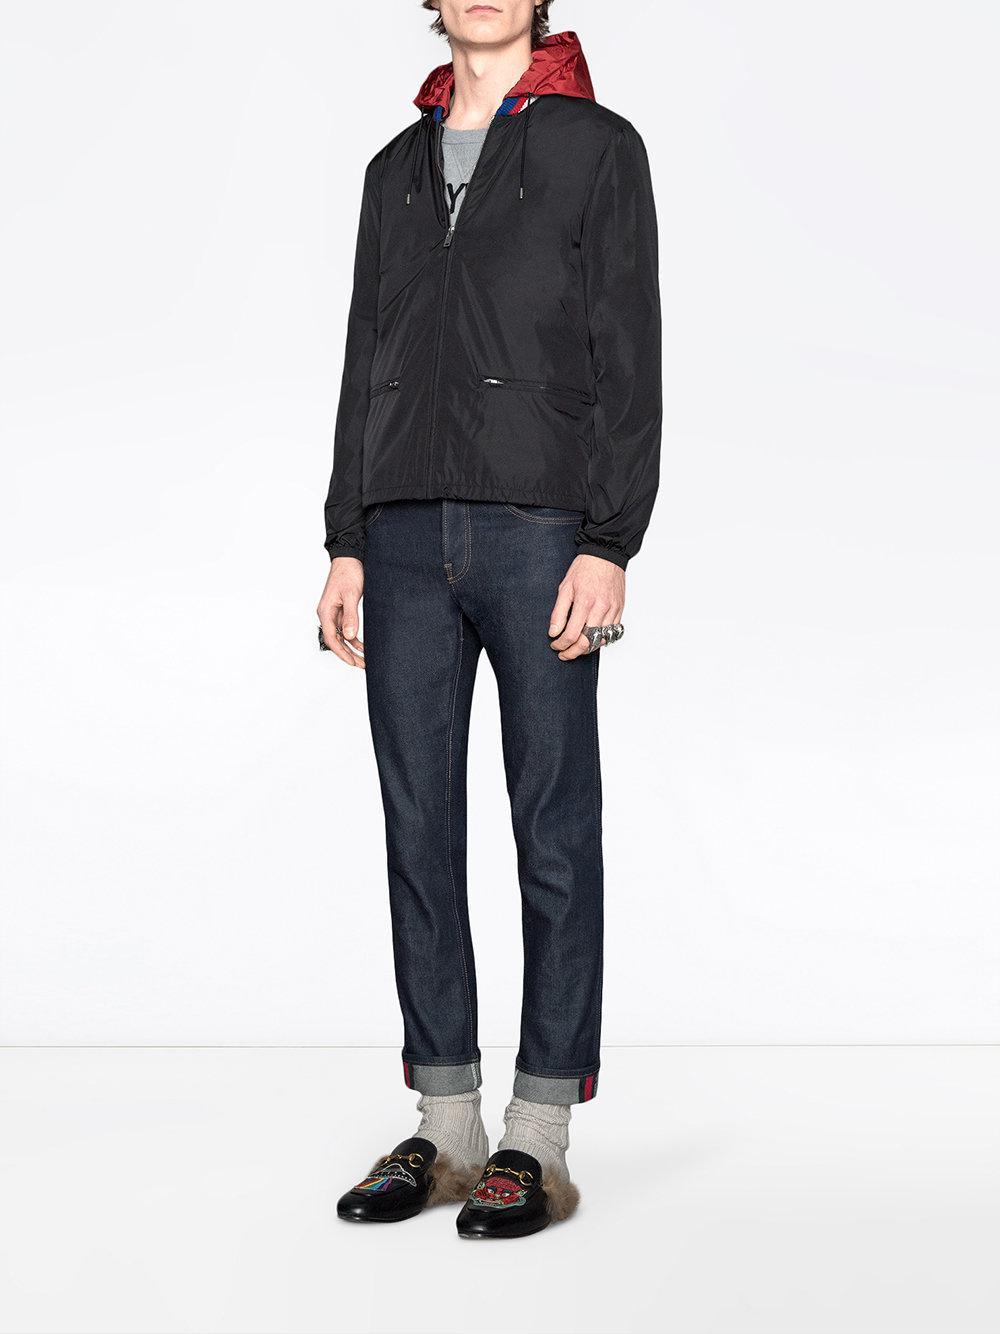 457b5158d Gucci Print Windbreaker in Black for Men - Save 25% - Lyst